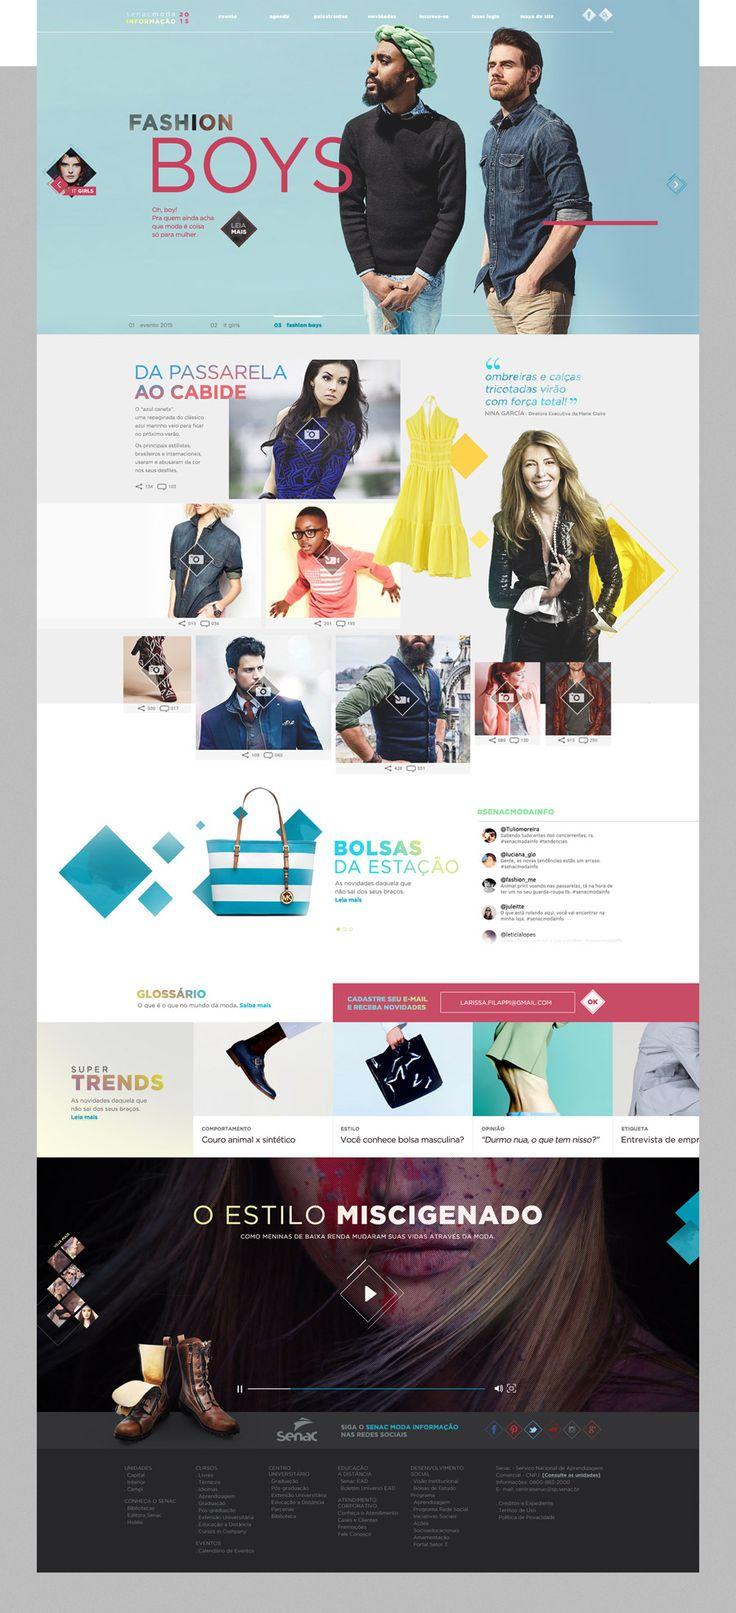 Poster design gallery - Modern Trendy Web Designs